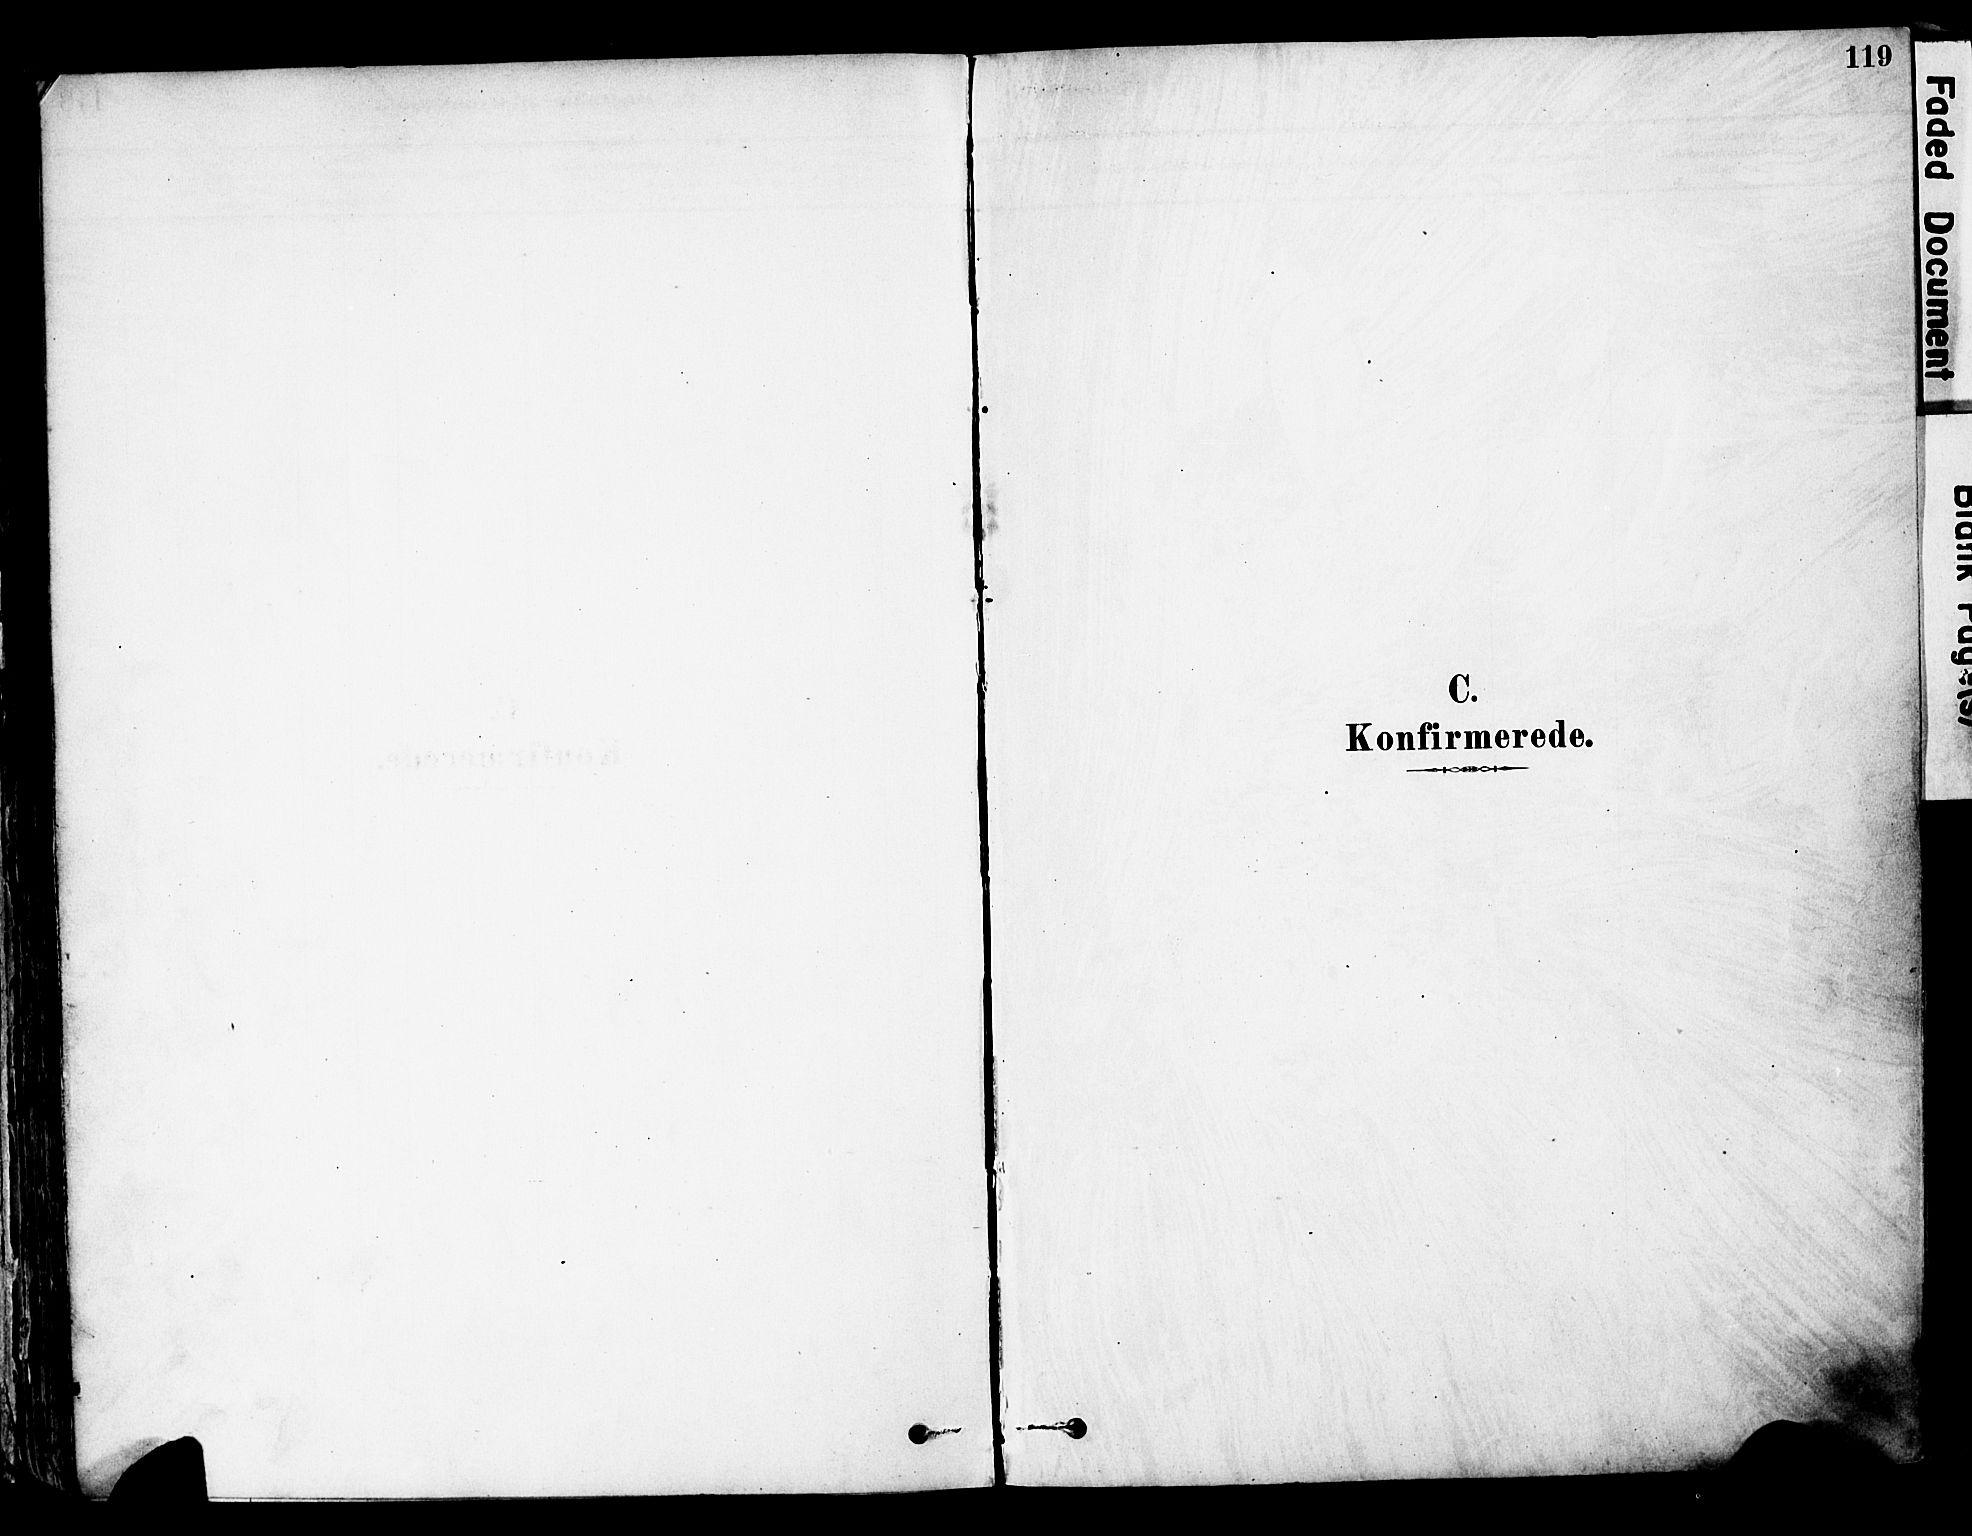 SAH, Øyer prestekontor, Ministerialbok nr. 8, 1878-1897, s. 119